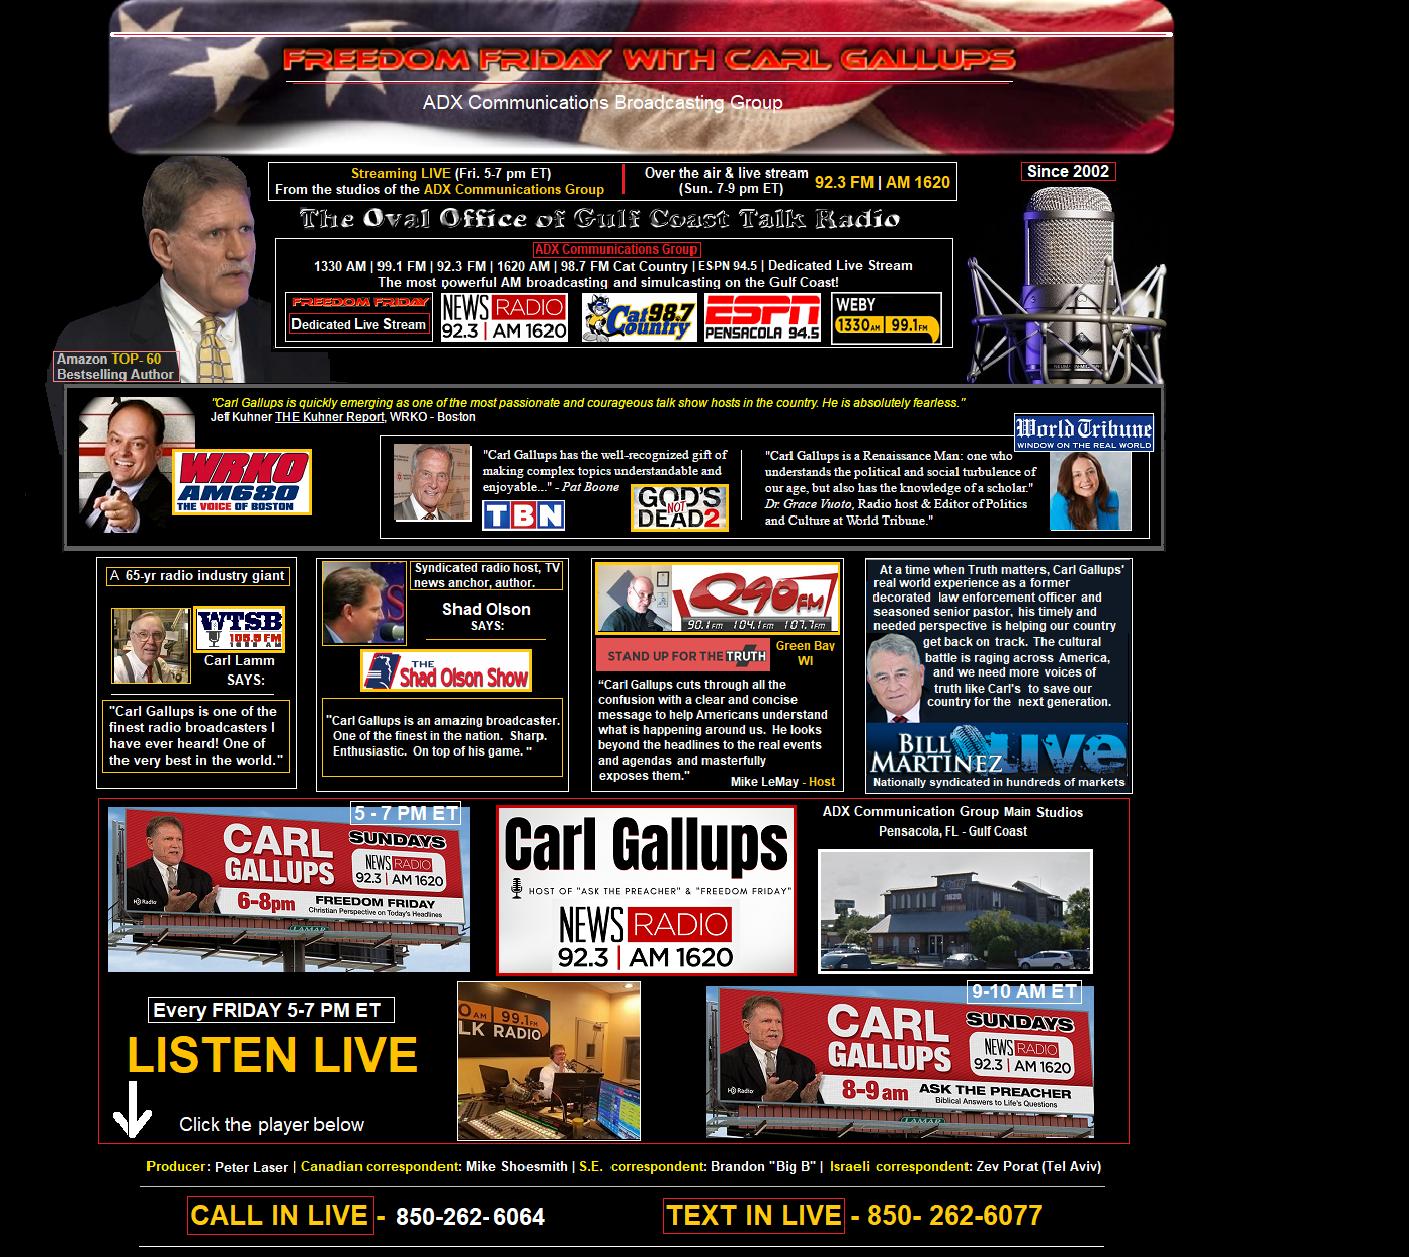 Freedom Friday With Carl Gallups   Carl Gallups Broadcasting